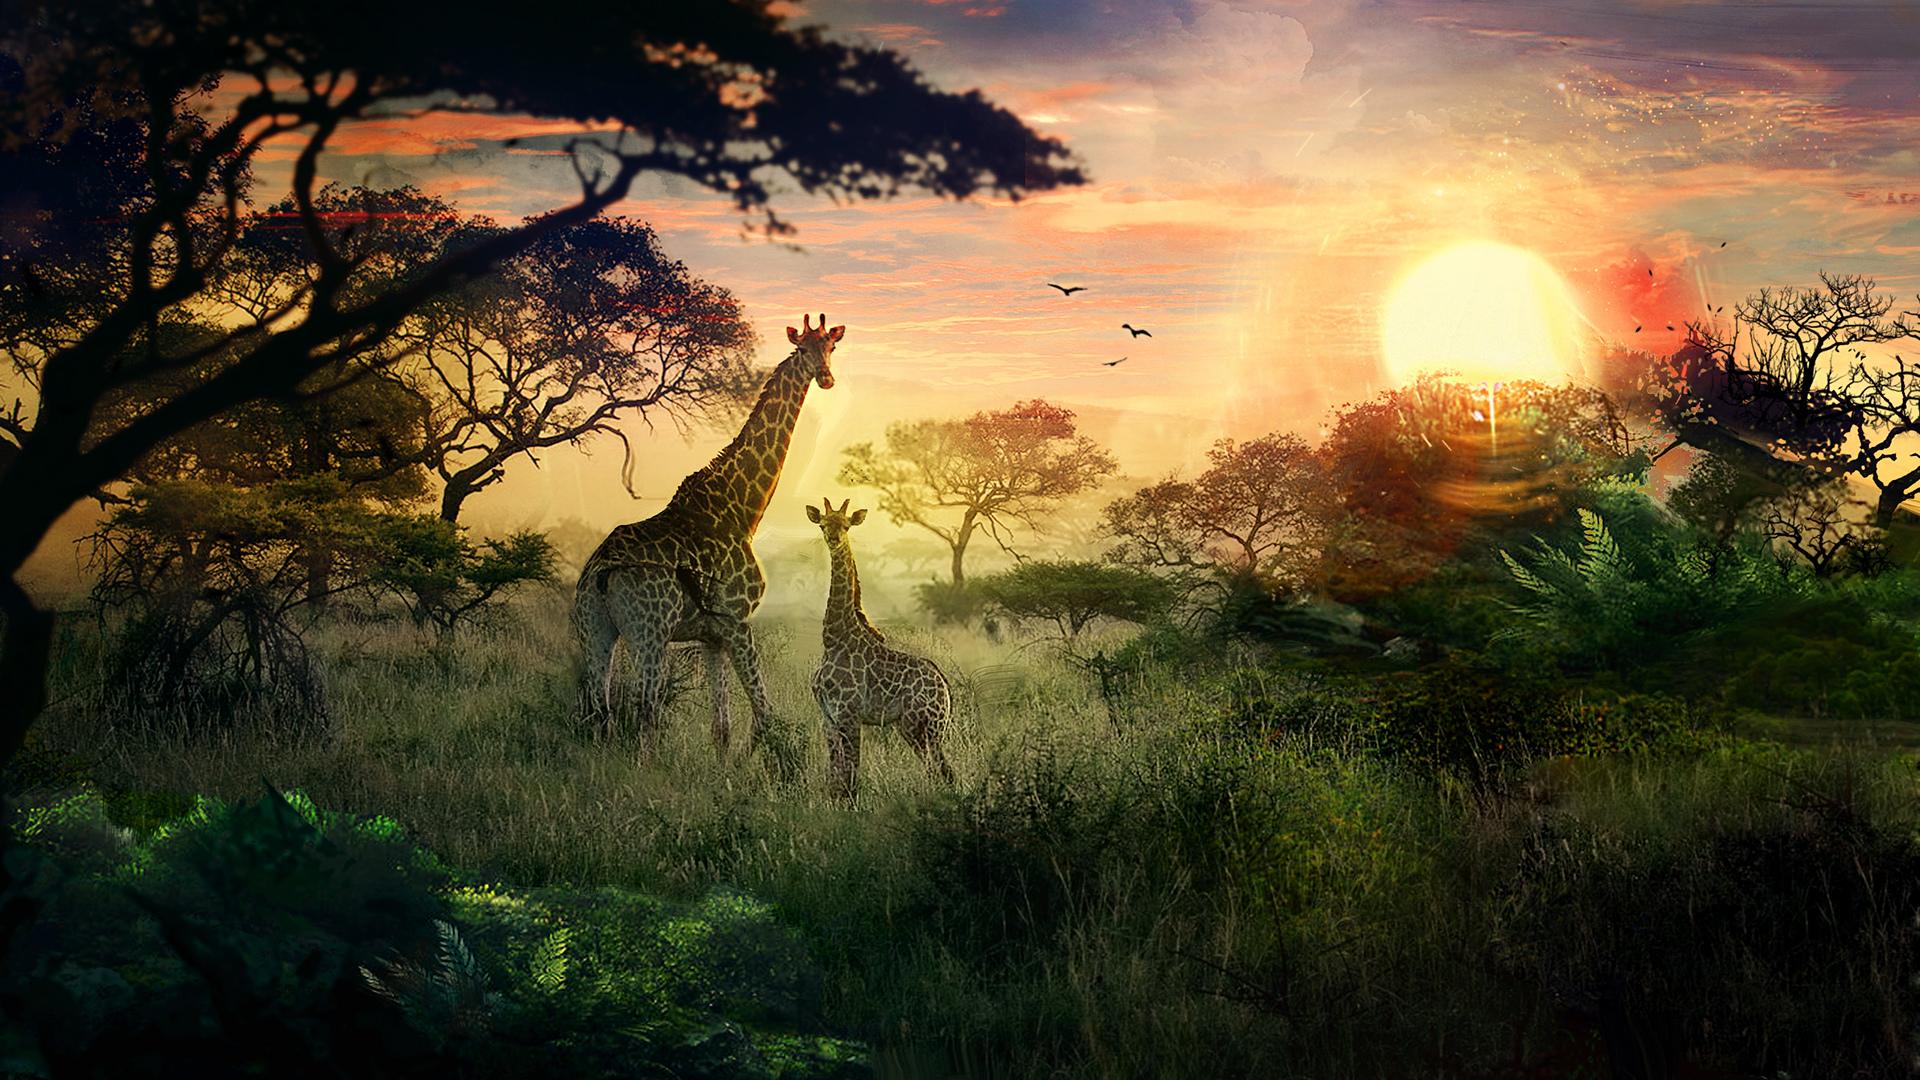 Awesome Nature Wallpapers Hd 14 Fondos De Pantalla De Jirafas Wallpapers Hd